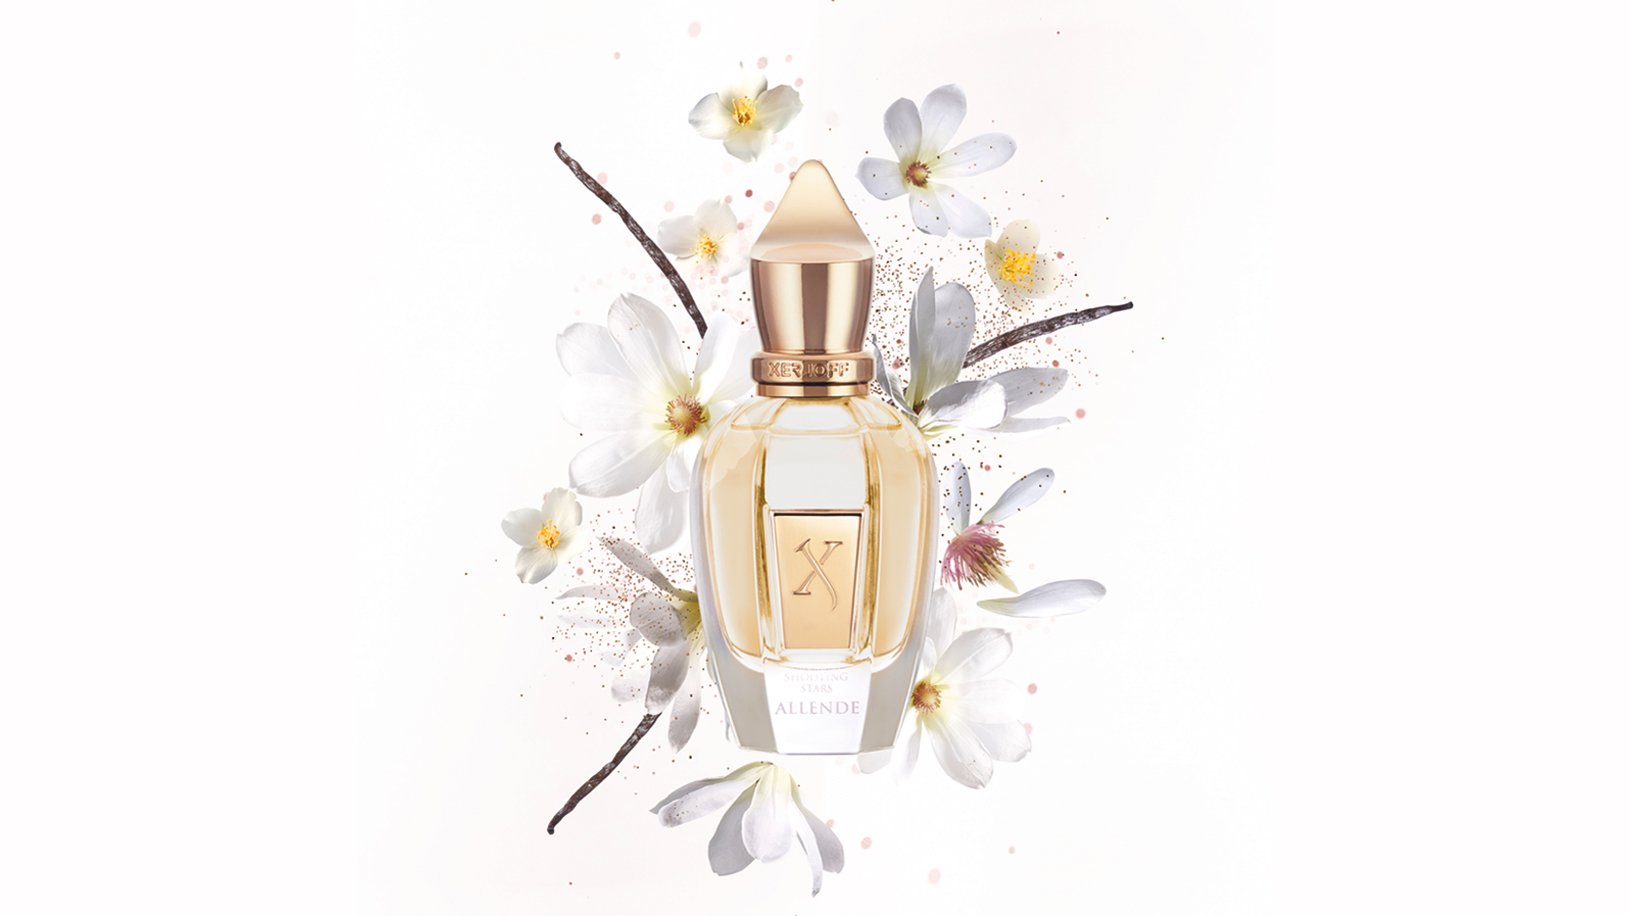 XerJoff Shooting Stars Allende Perfume